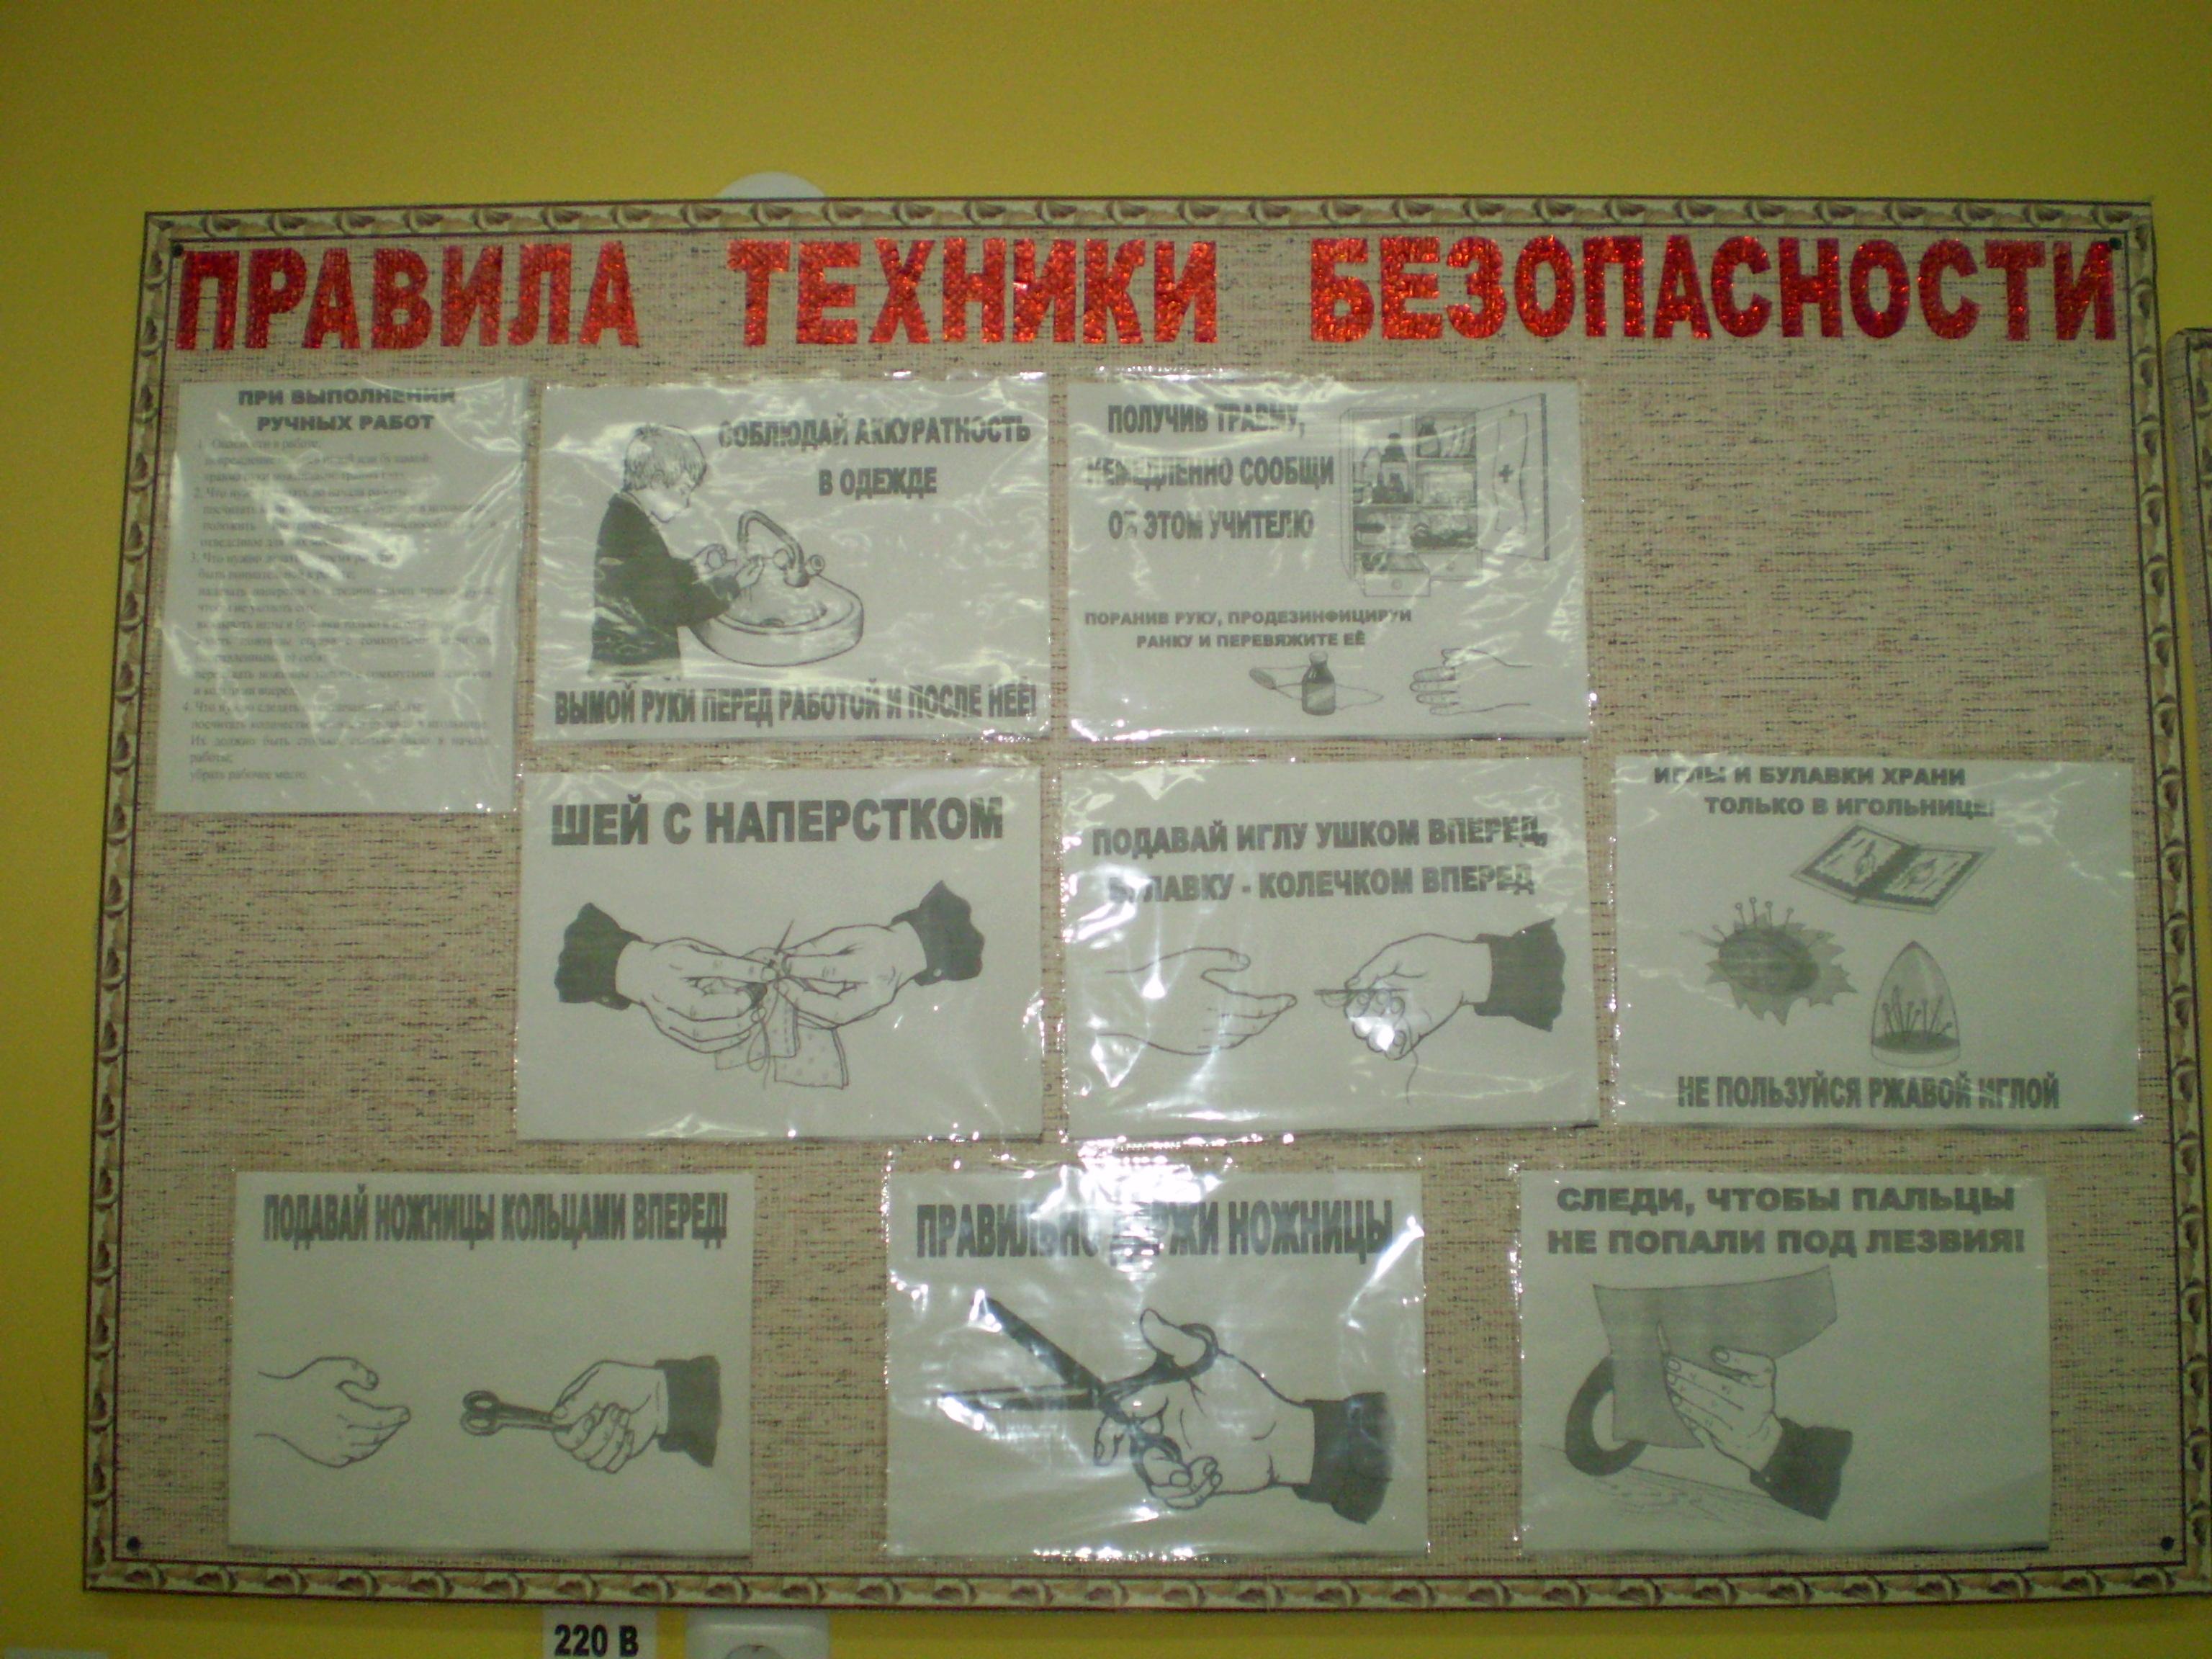 Охрана труда при вязании крючком